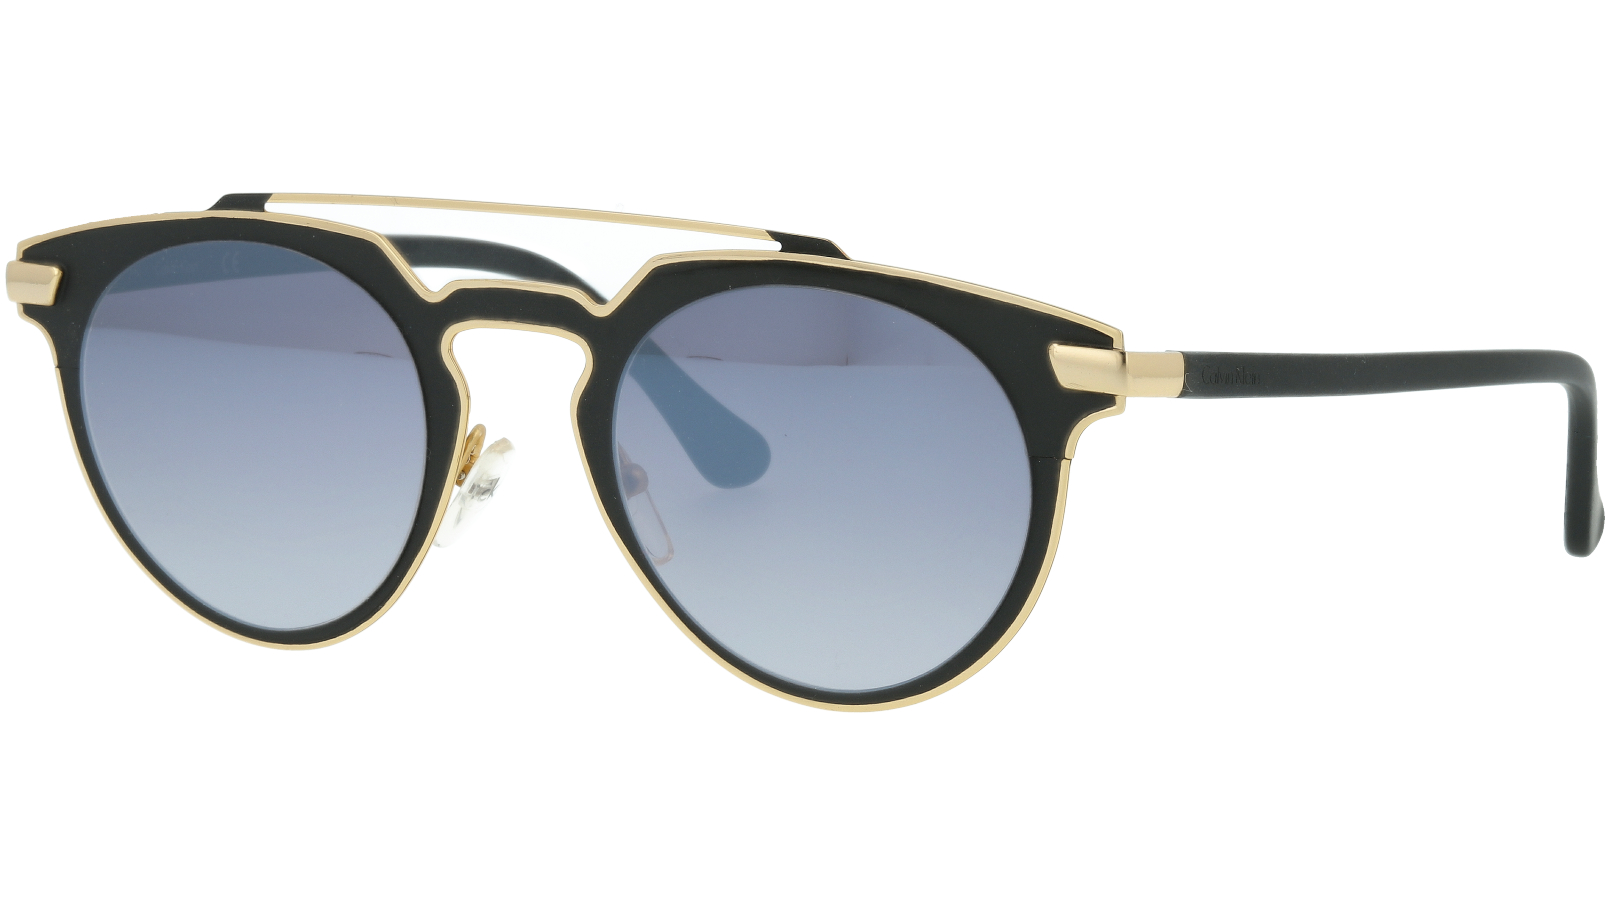 Calvin Klein CK2147S 625 48 Brown Sunglasses